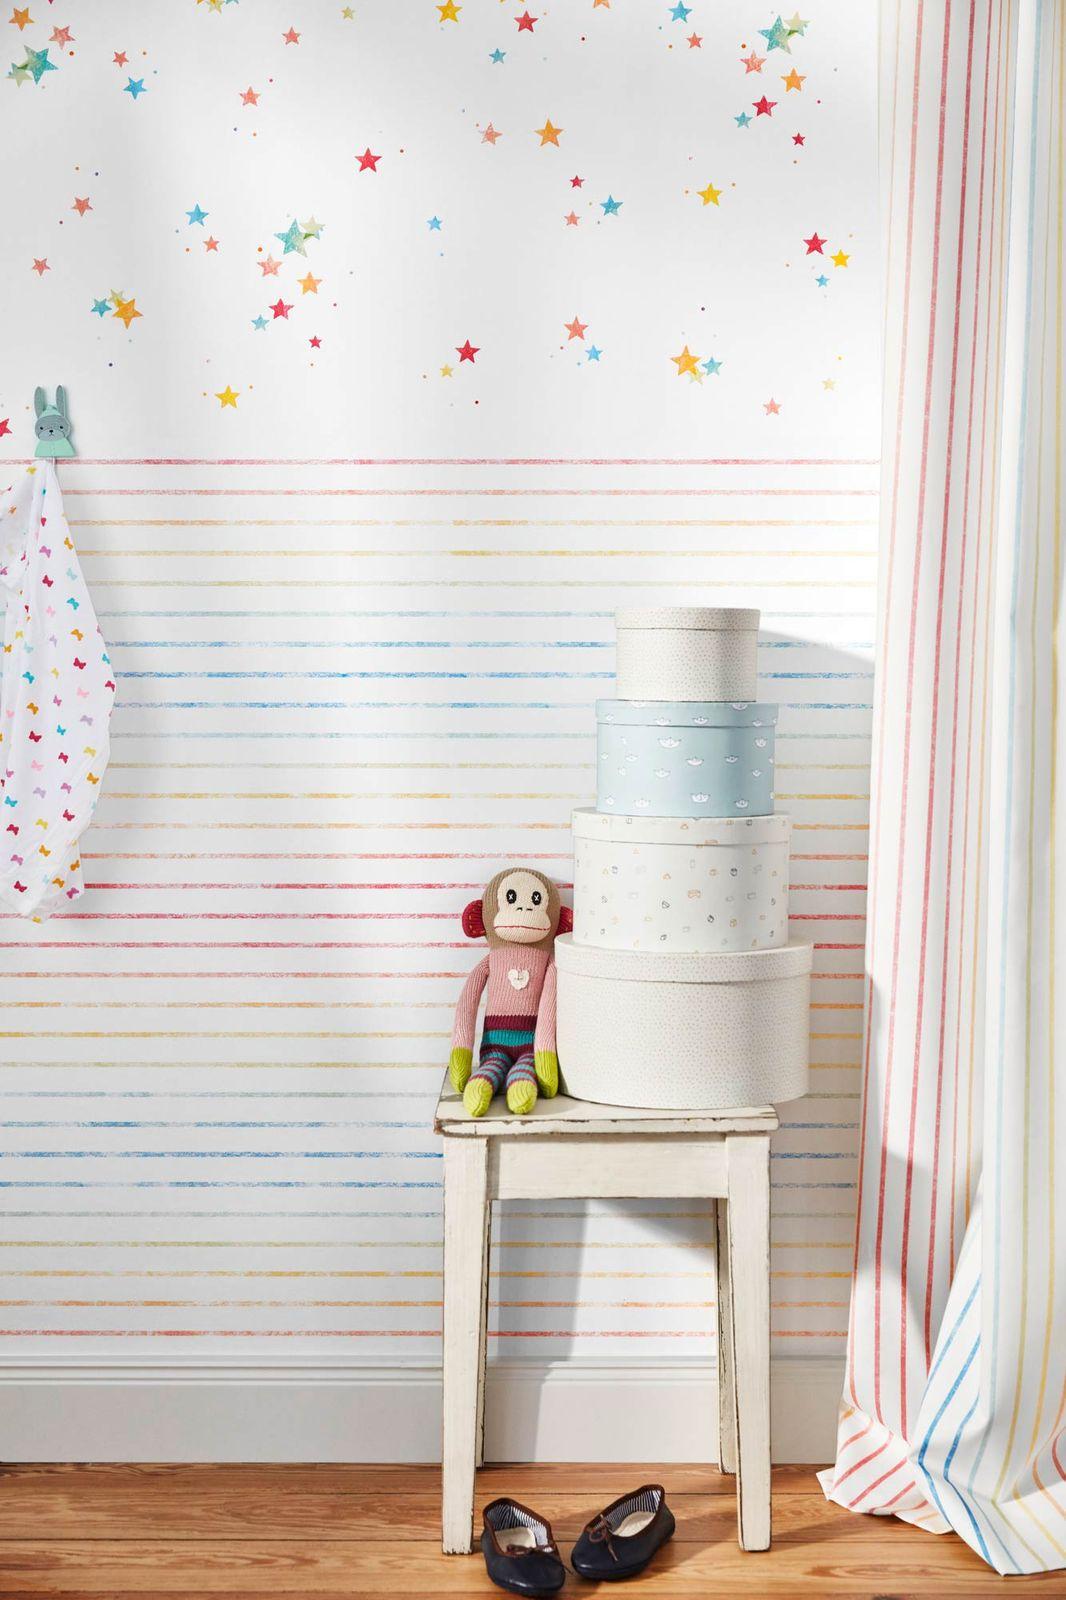 Full Size of Esprit Kids Tapete Sterne Punkte Wei Bunt 35696 2 Regal Kinderzimmer Regale Fototapete Wohnzimmer Fototapeten Tapeten Schlafzimmer Fenster Weiß Ideen Für Die Wohnzimmer Kinderzimmer Tapete